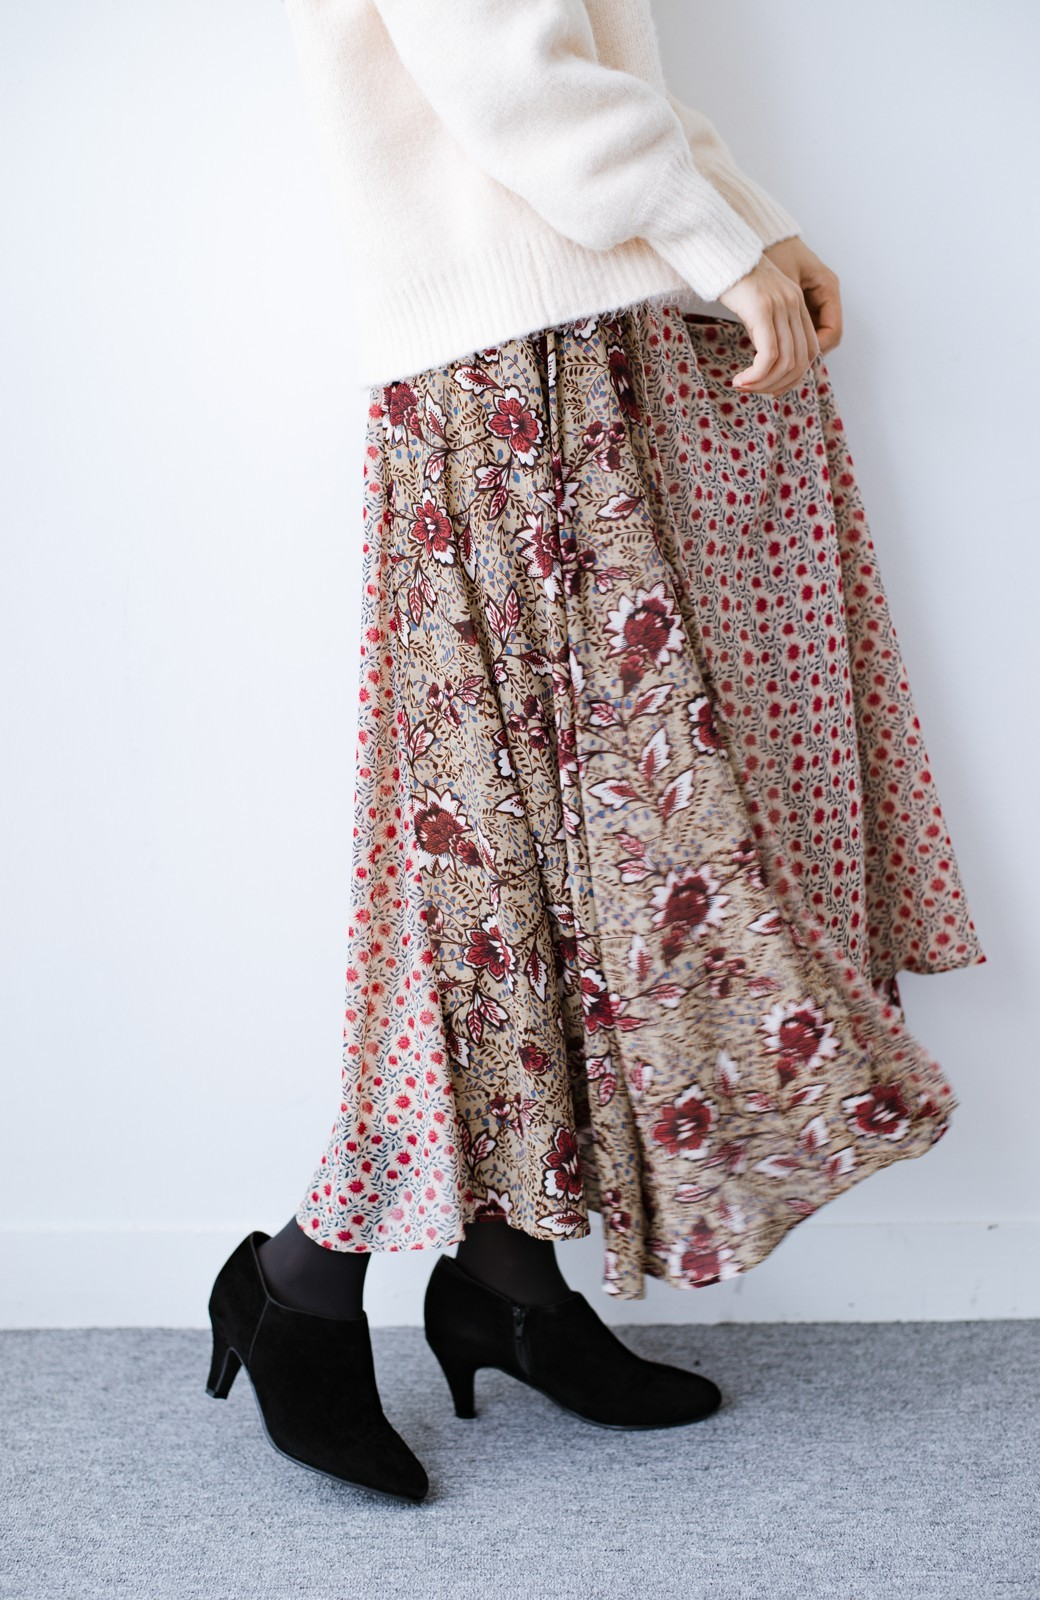 haco! 【洗濯機洗いOK】シンプルなトップスに合わせるだけでかわいくなれる MIX柄スカート <ベージュ系その他>の商品写真1